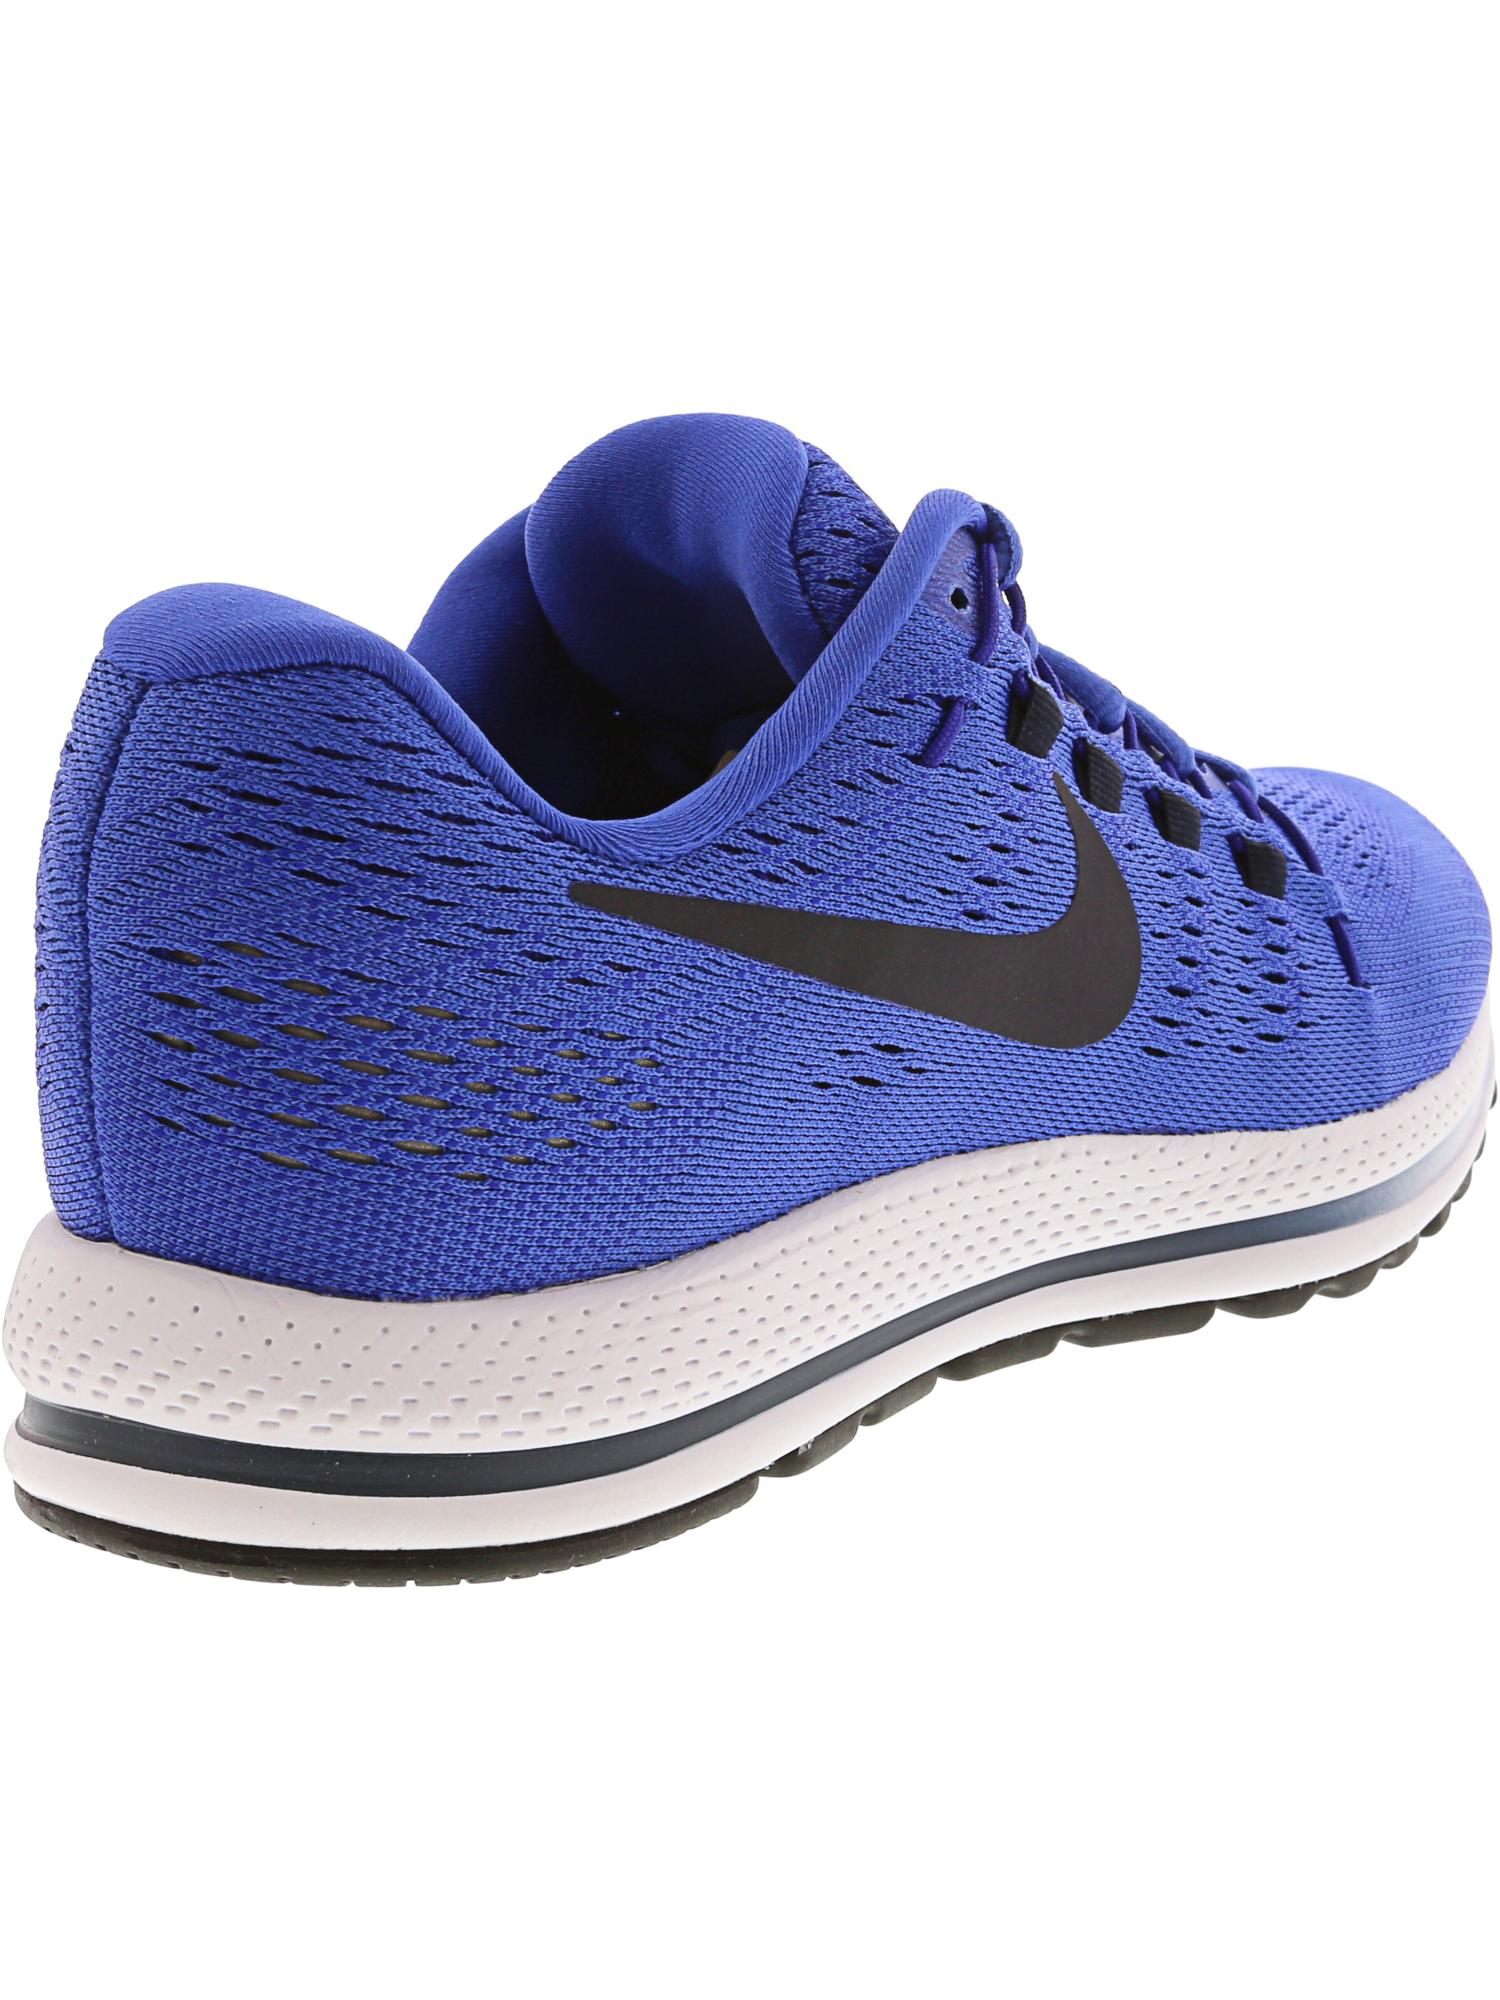 Nike Air Zoom Vomero 12 - Men's | Runner's World